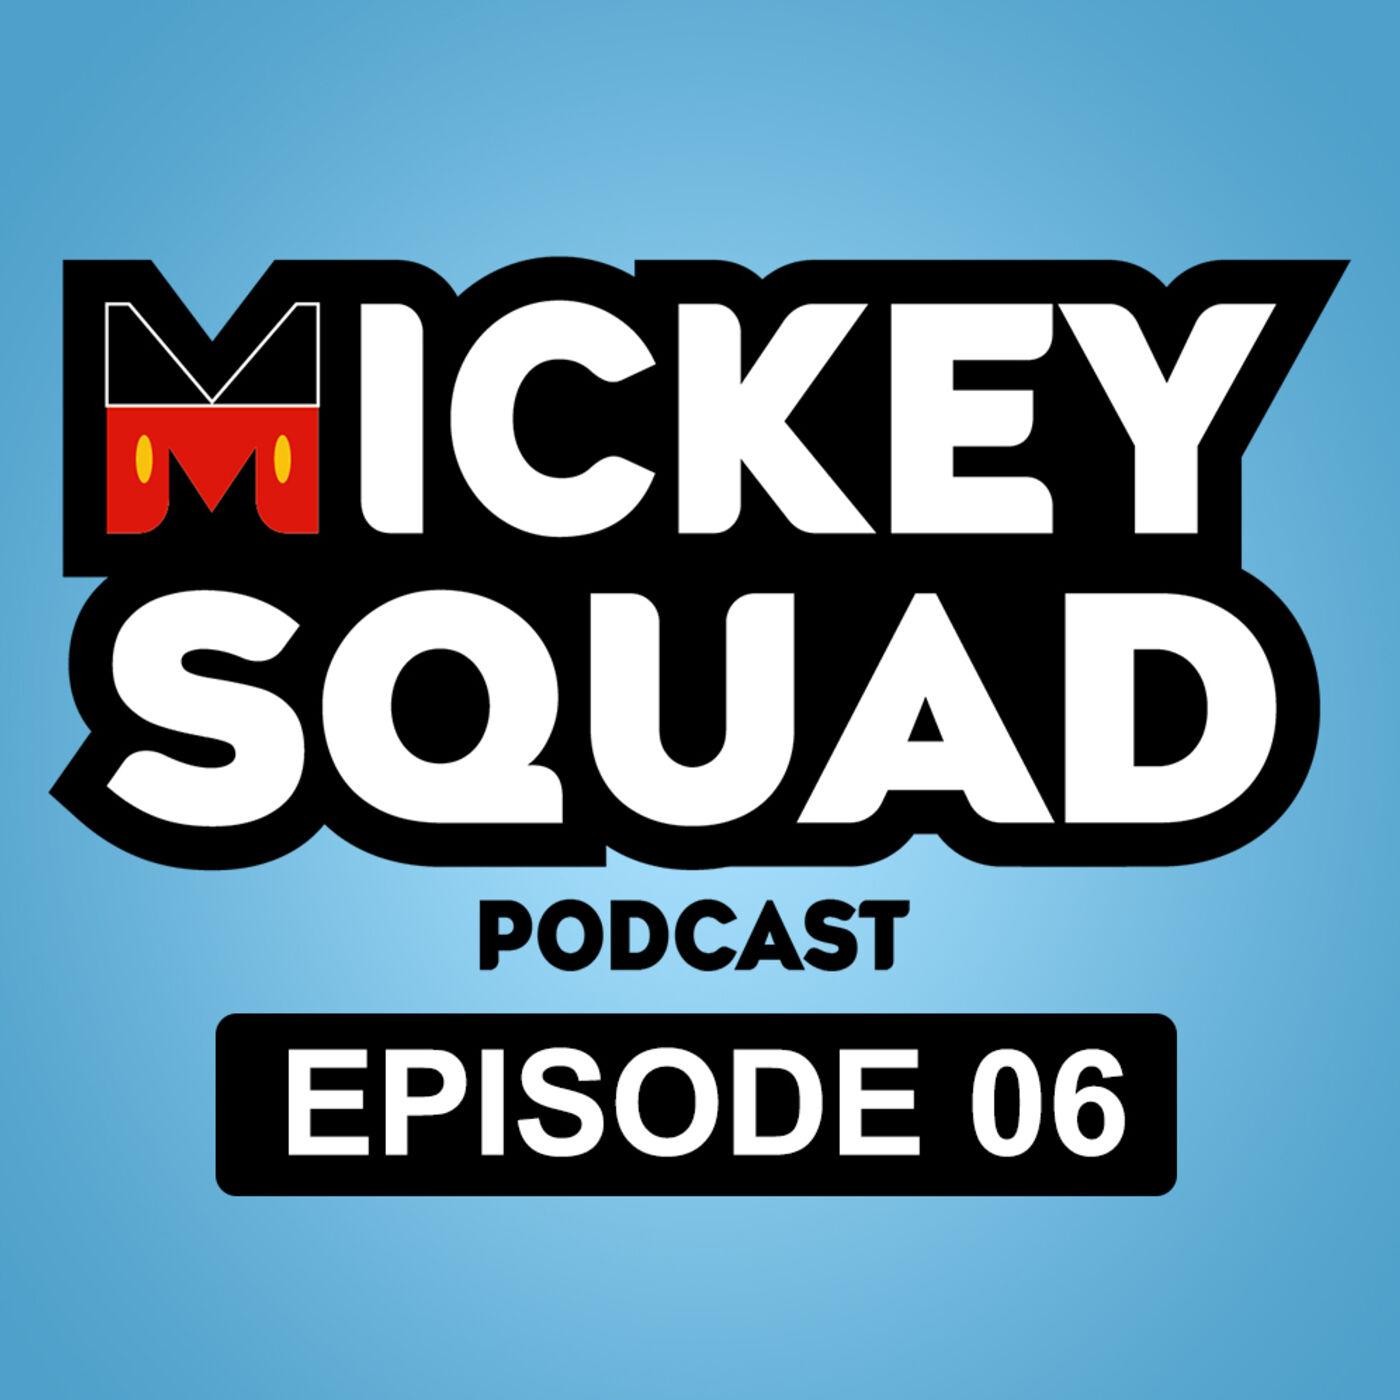 Episode 06 - Disneyland Survival Guide